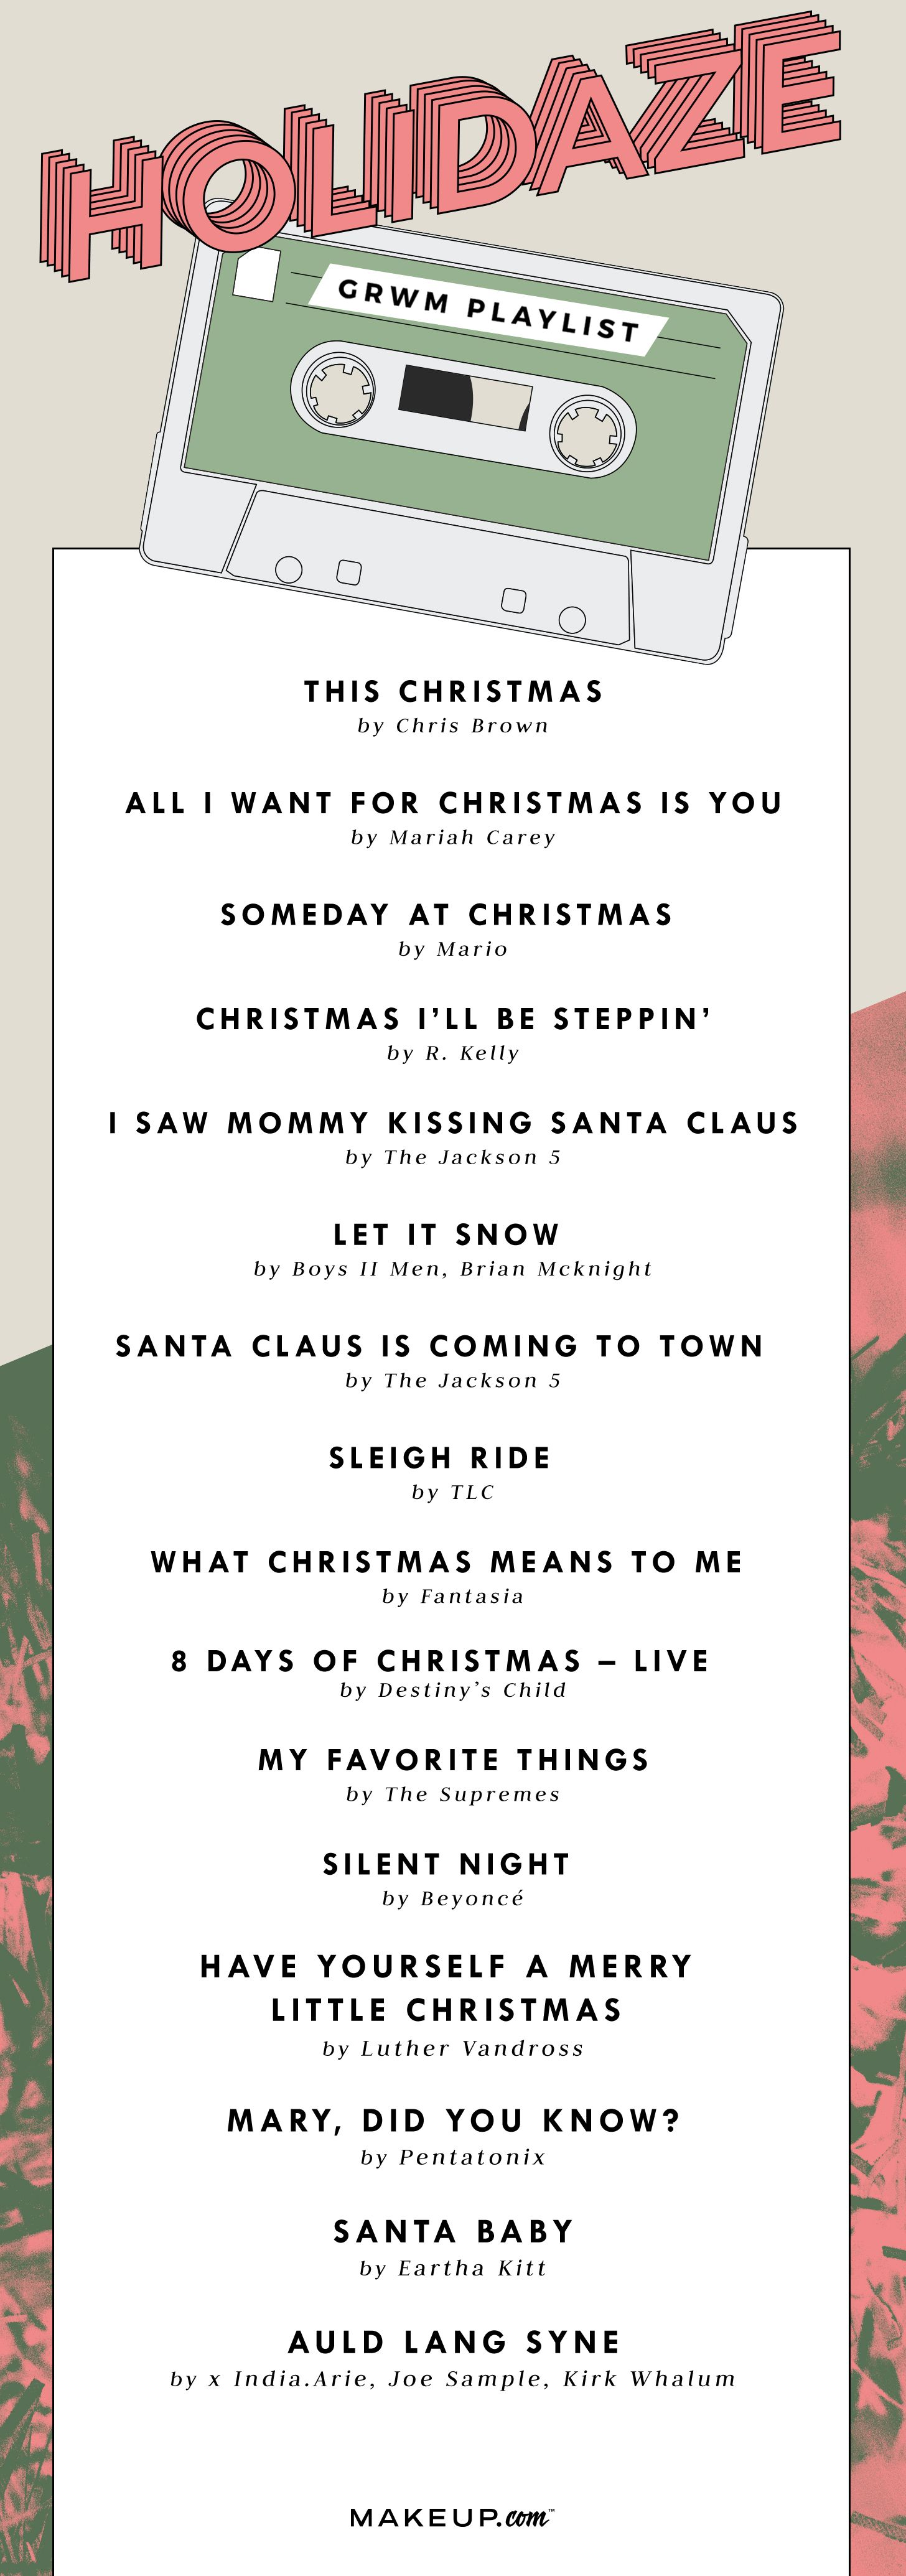 Grwm Playlist Chill Holidays Holiday Music Playlist Music Playlist Playlist David guetta light my body up feat nicki minaj & lil wayne. pinterest